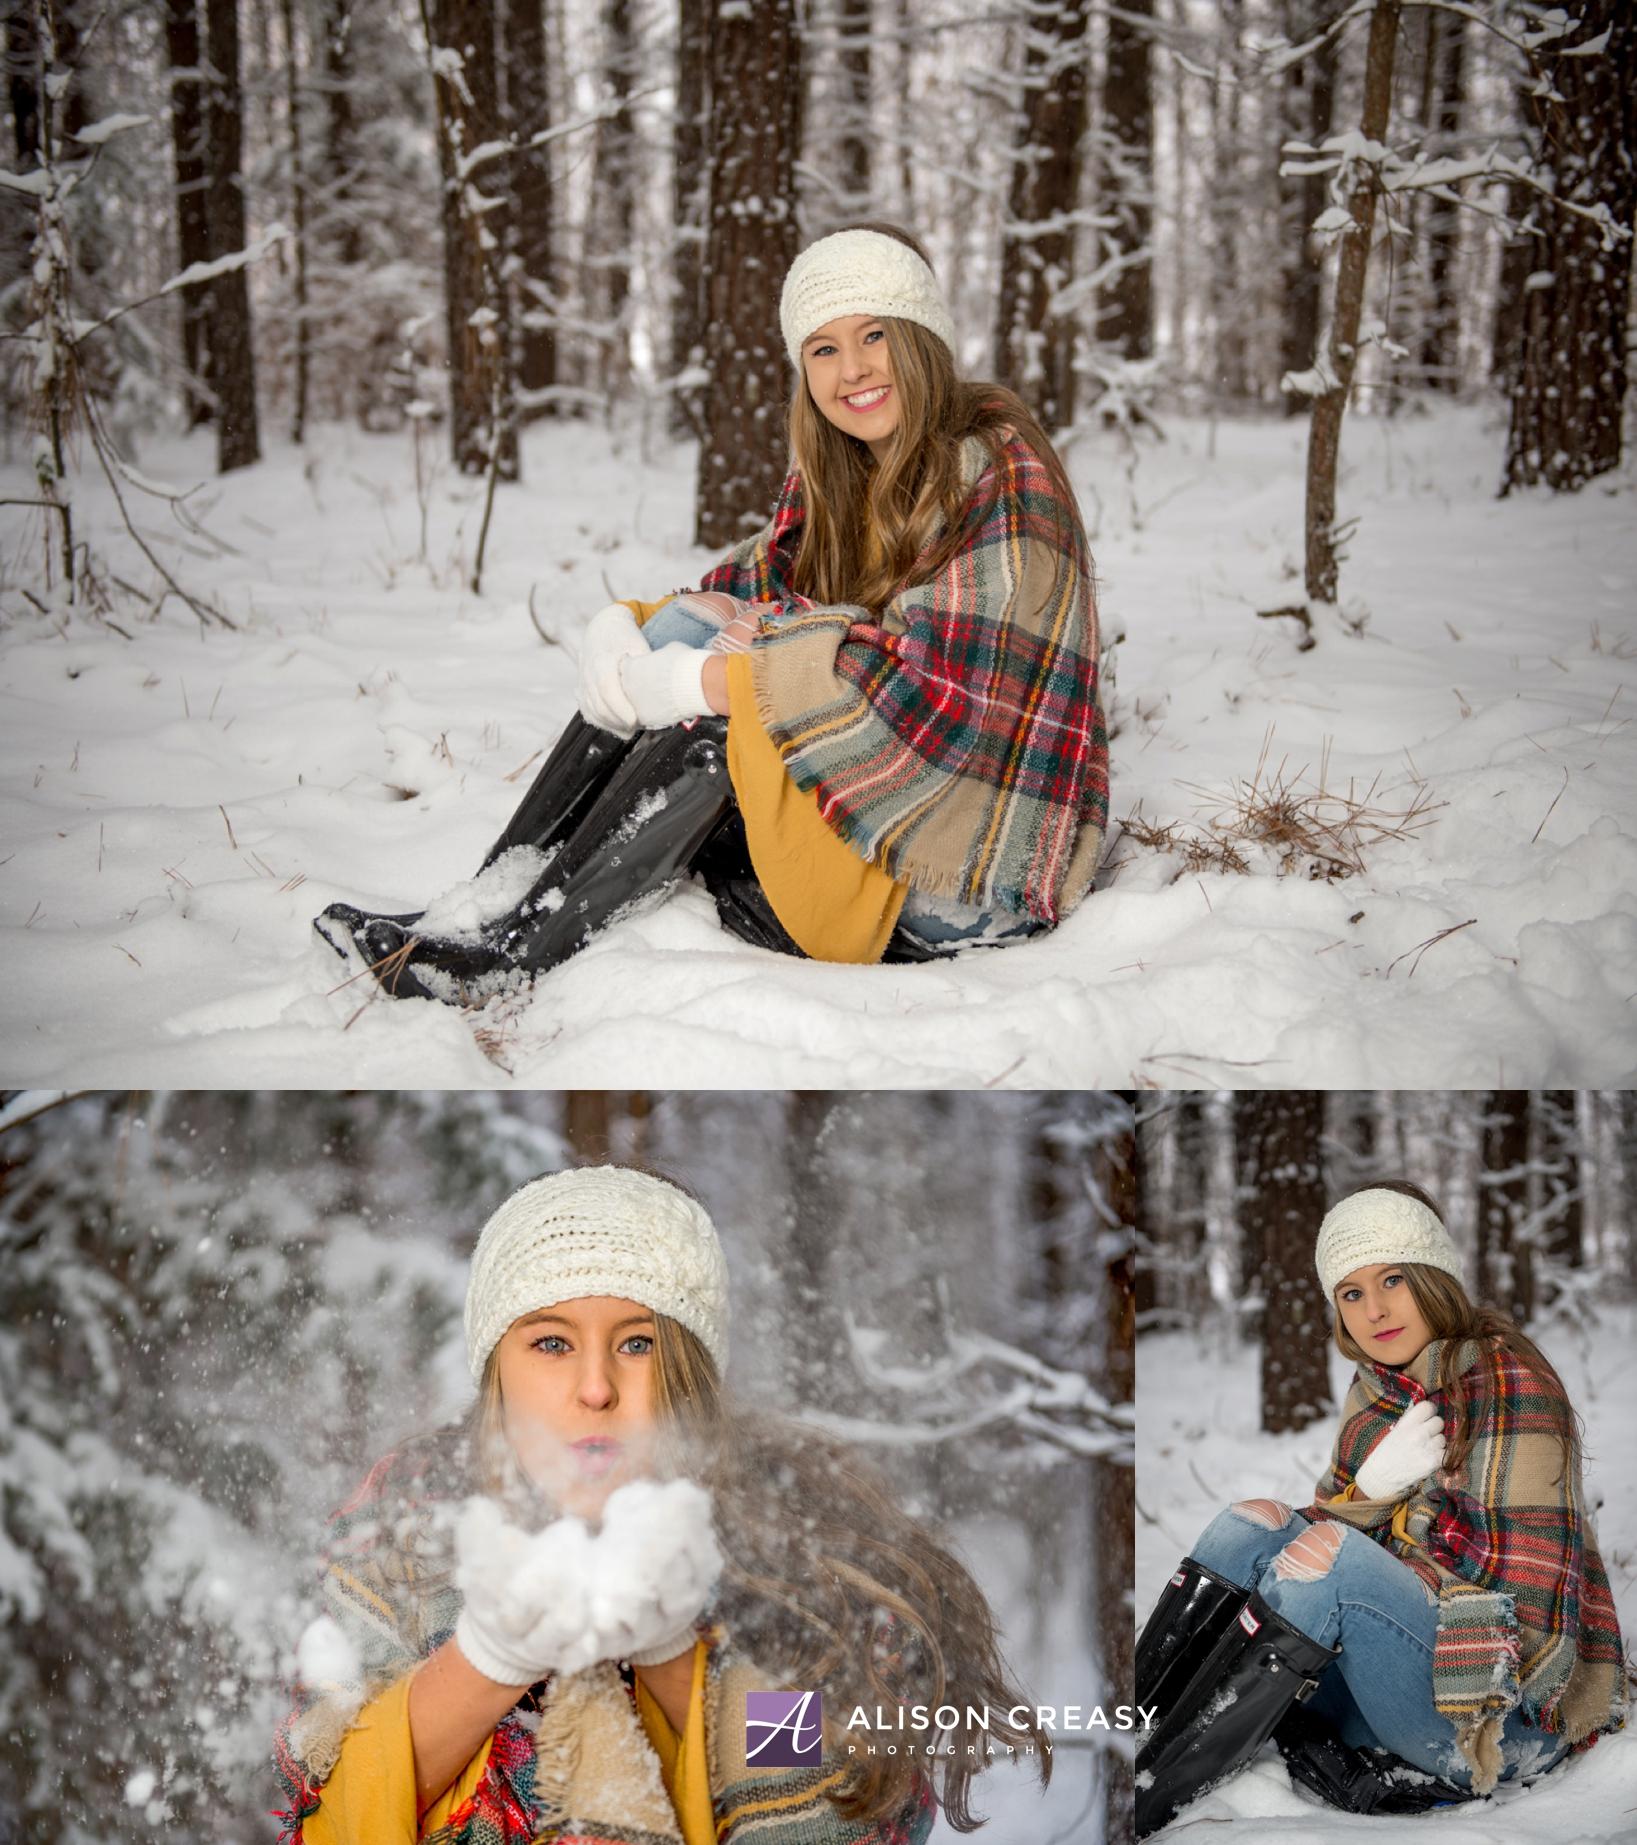 Alison-Creasy-Photography-Lynchburg-VA-Senior-Photographer_0020.jpg